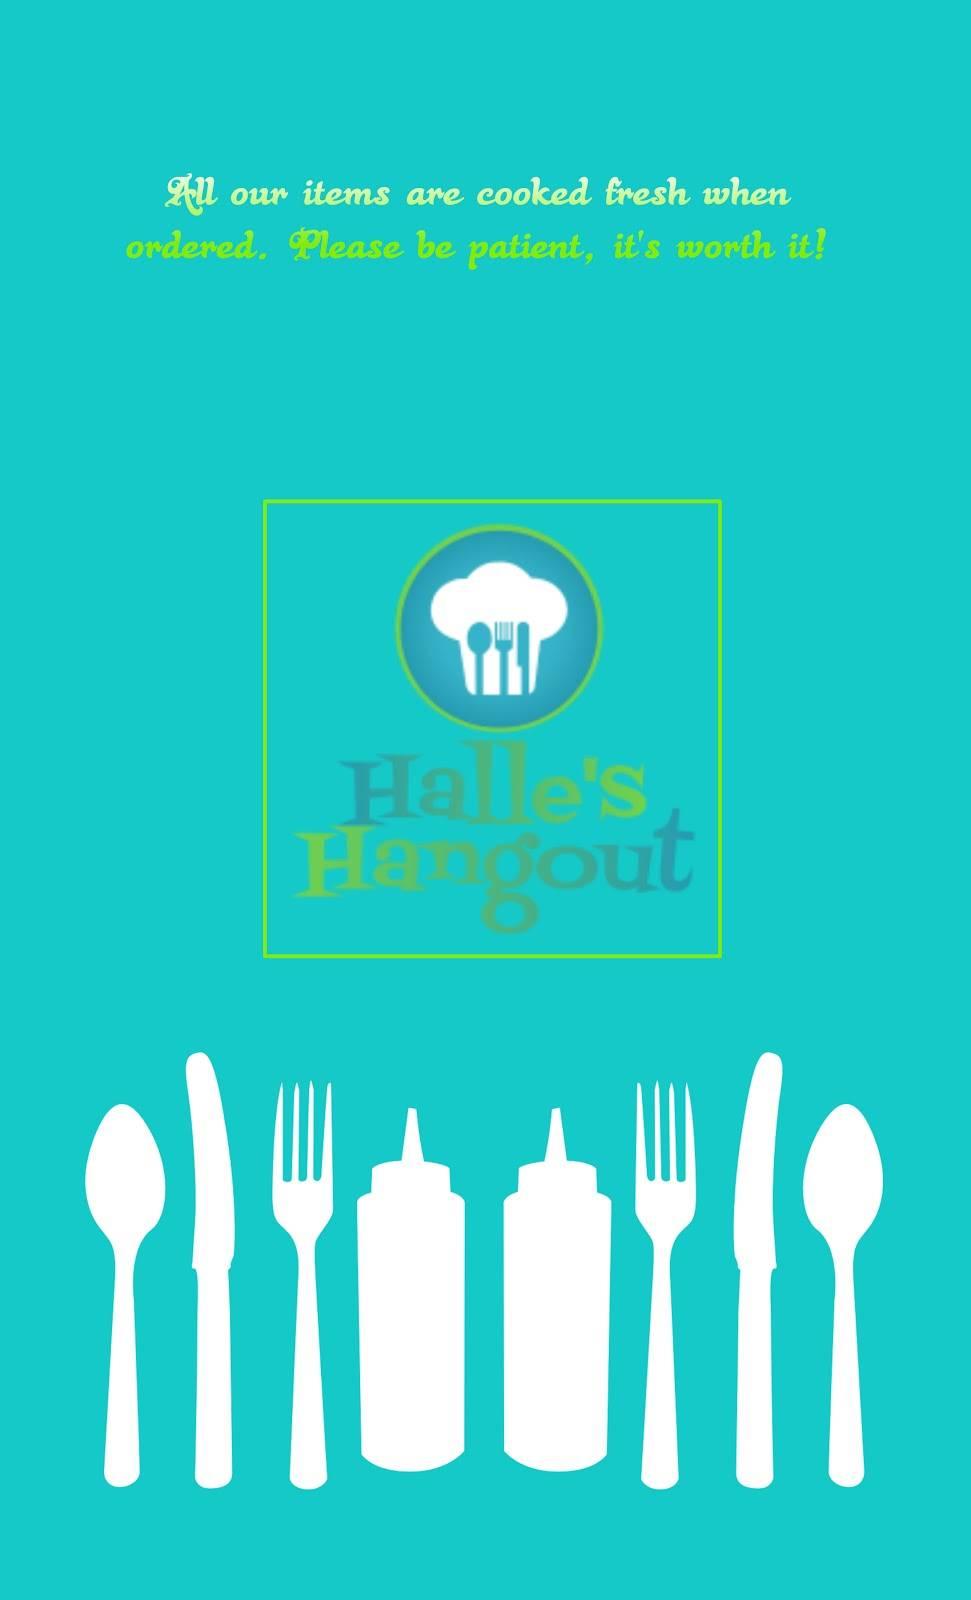 Halles Hangout   restaurant   610 Wayne Rd, Savannah, TN 38372, USA   7314383620 OR +1 731-438-3620